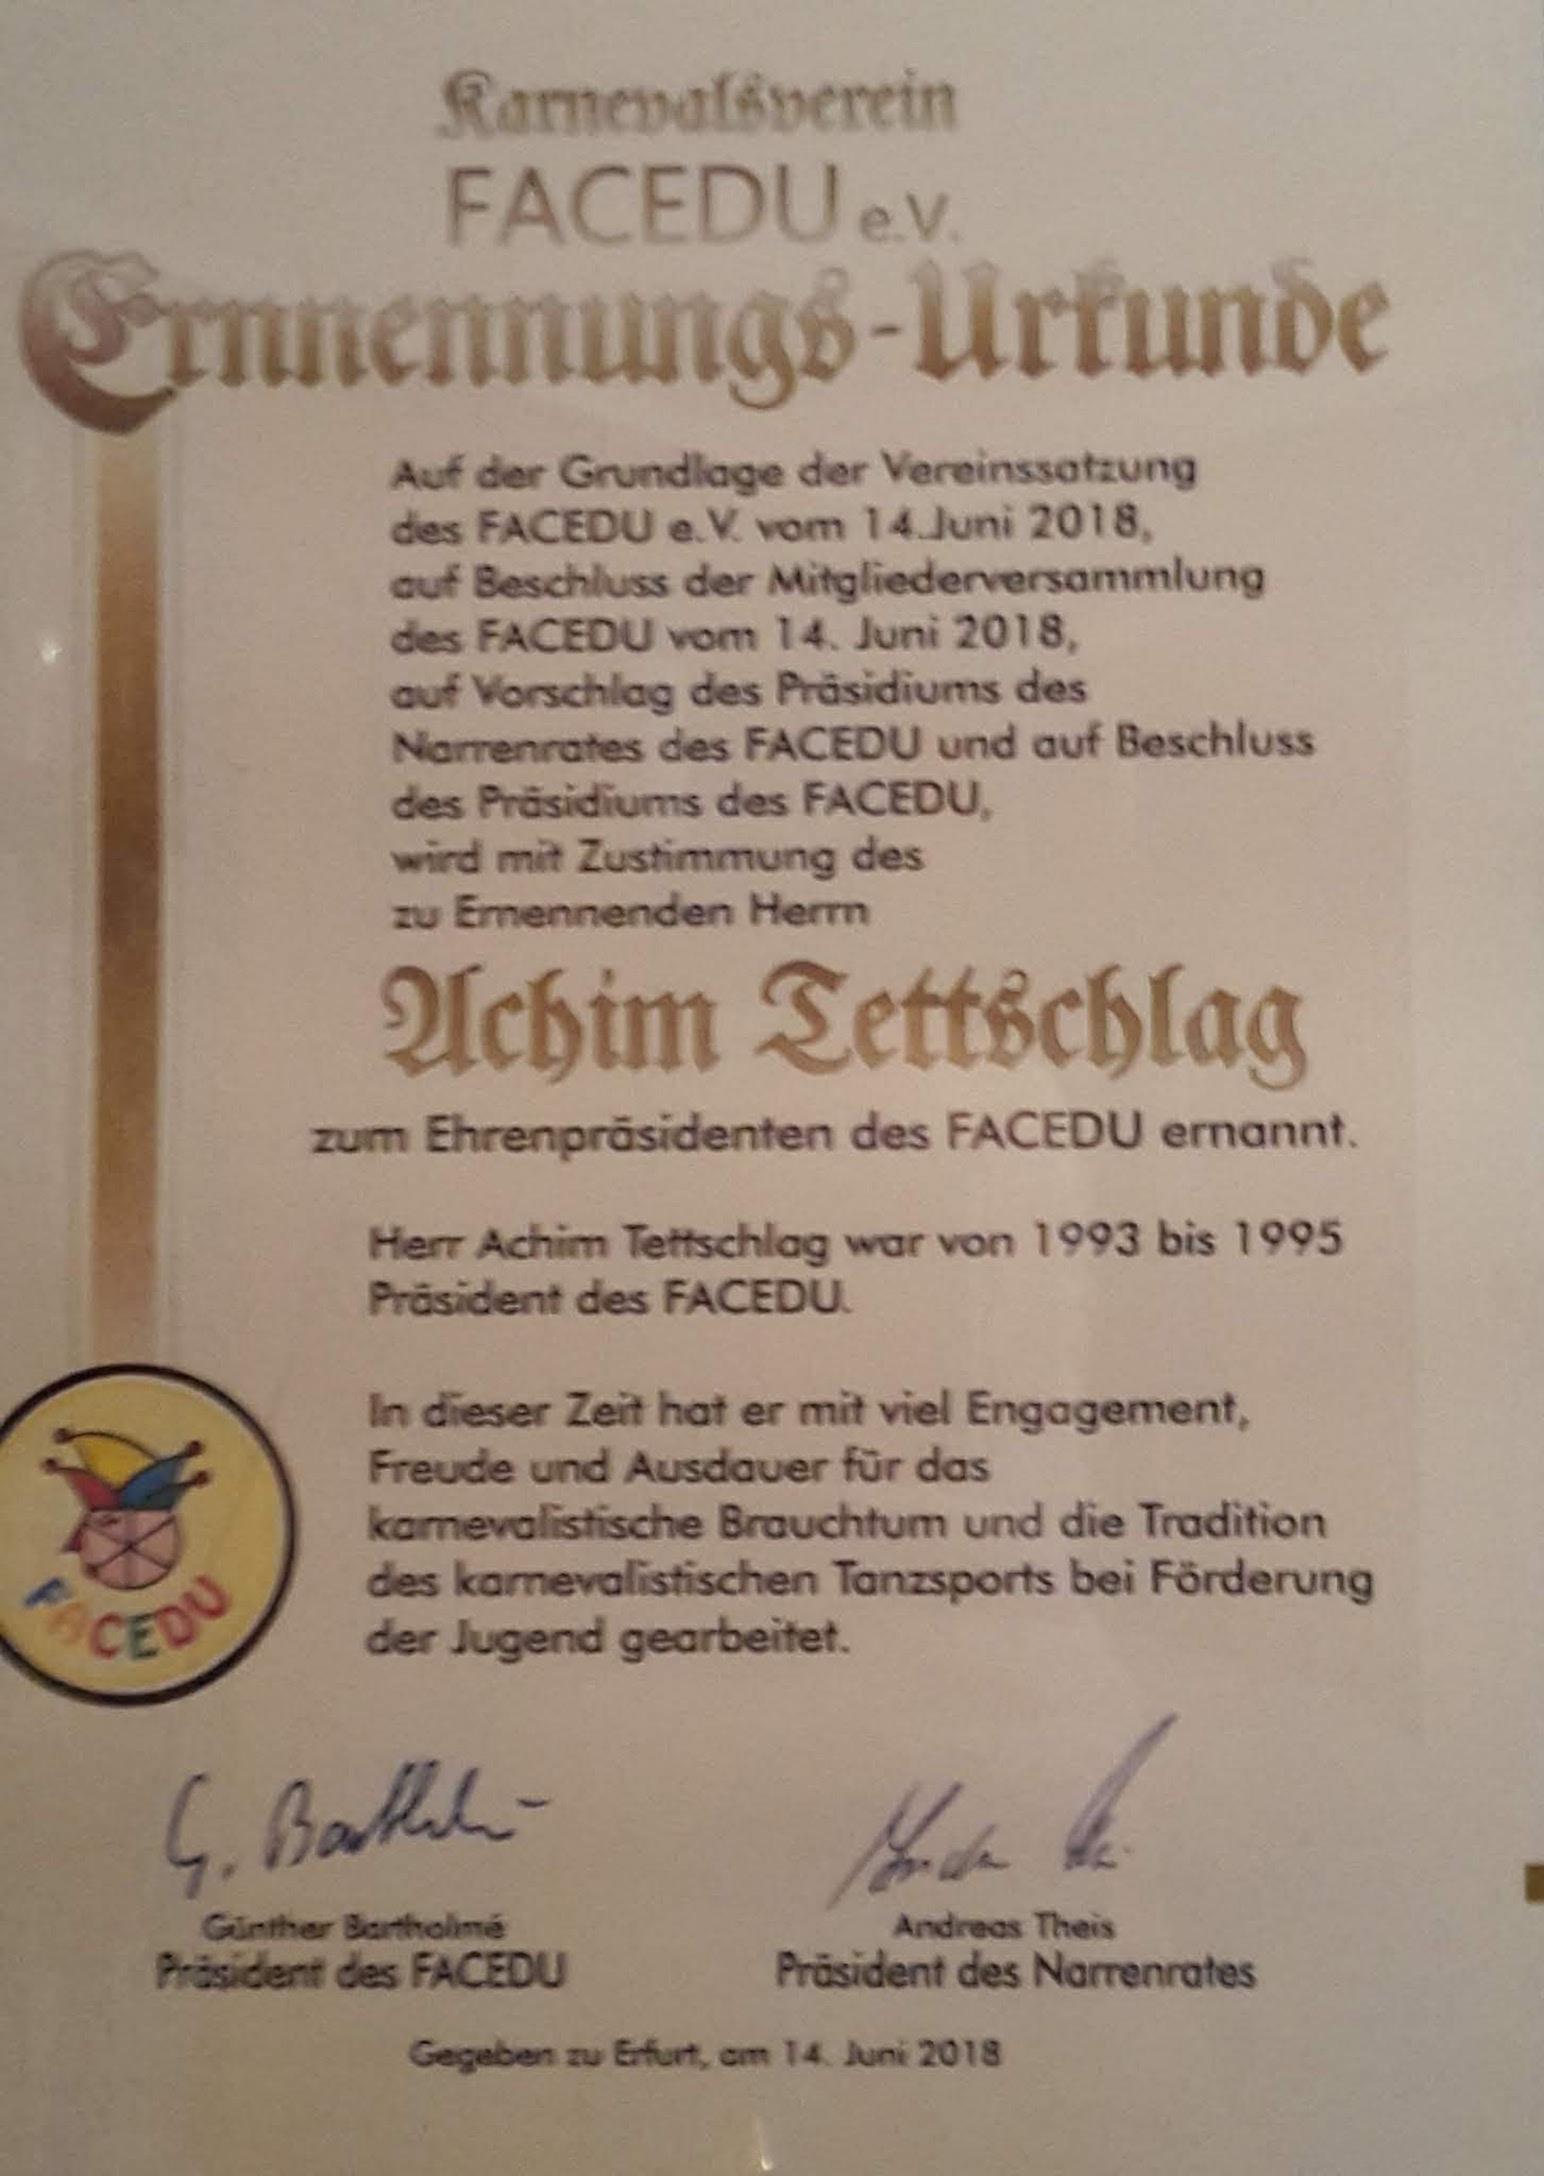 Karneval_FaCeDu - EhrenpräsidentenUrkunde 2018